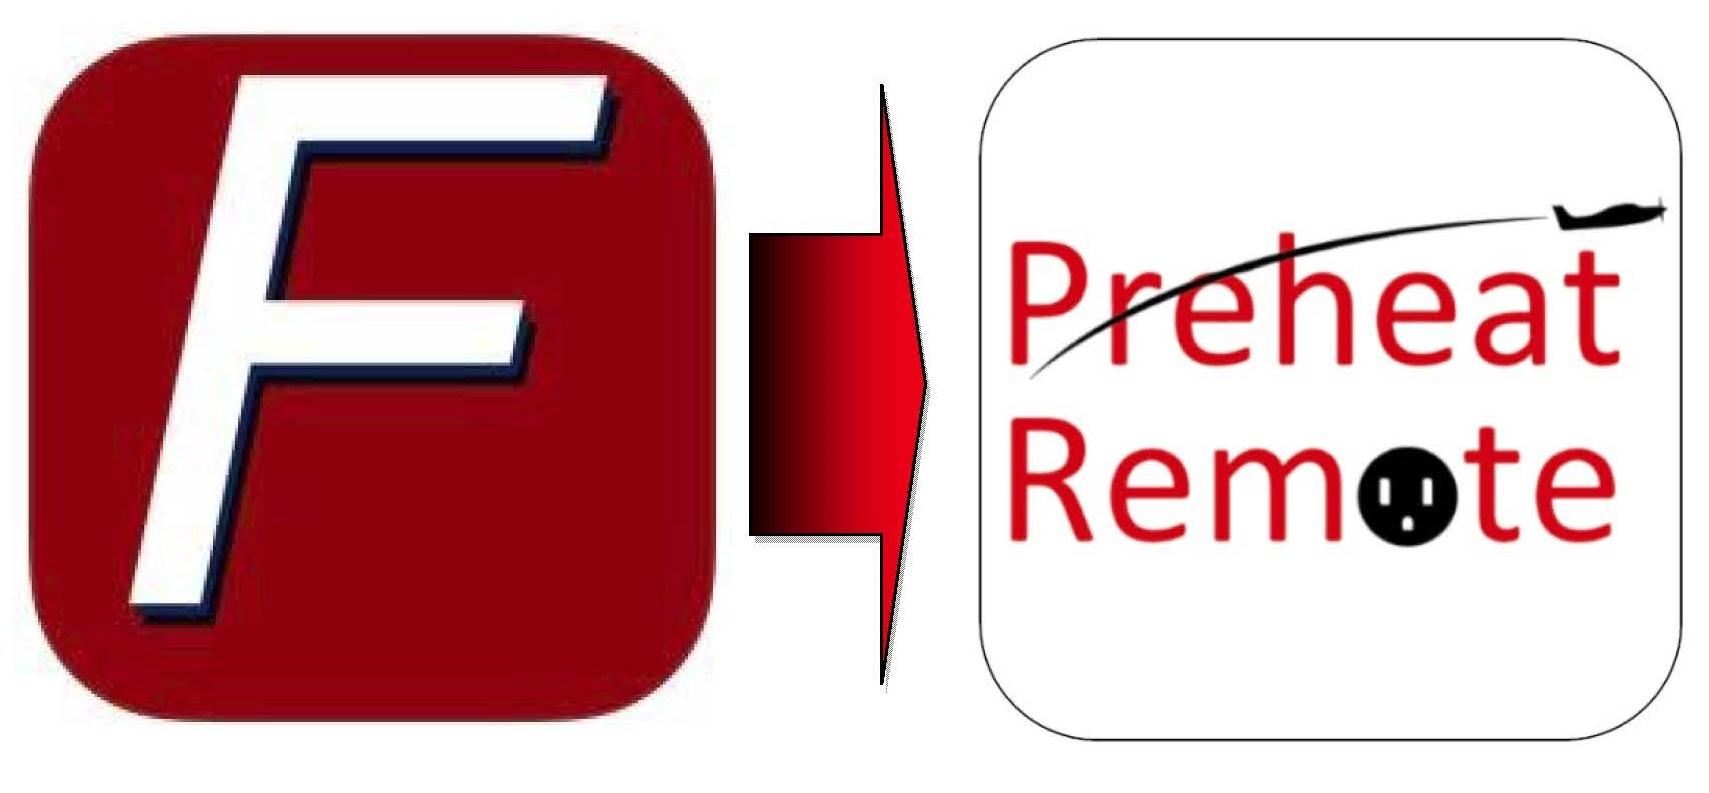 FST-to-PreheatRemote